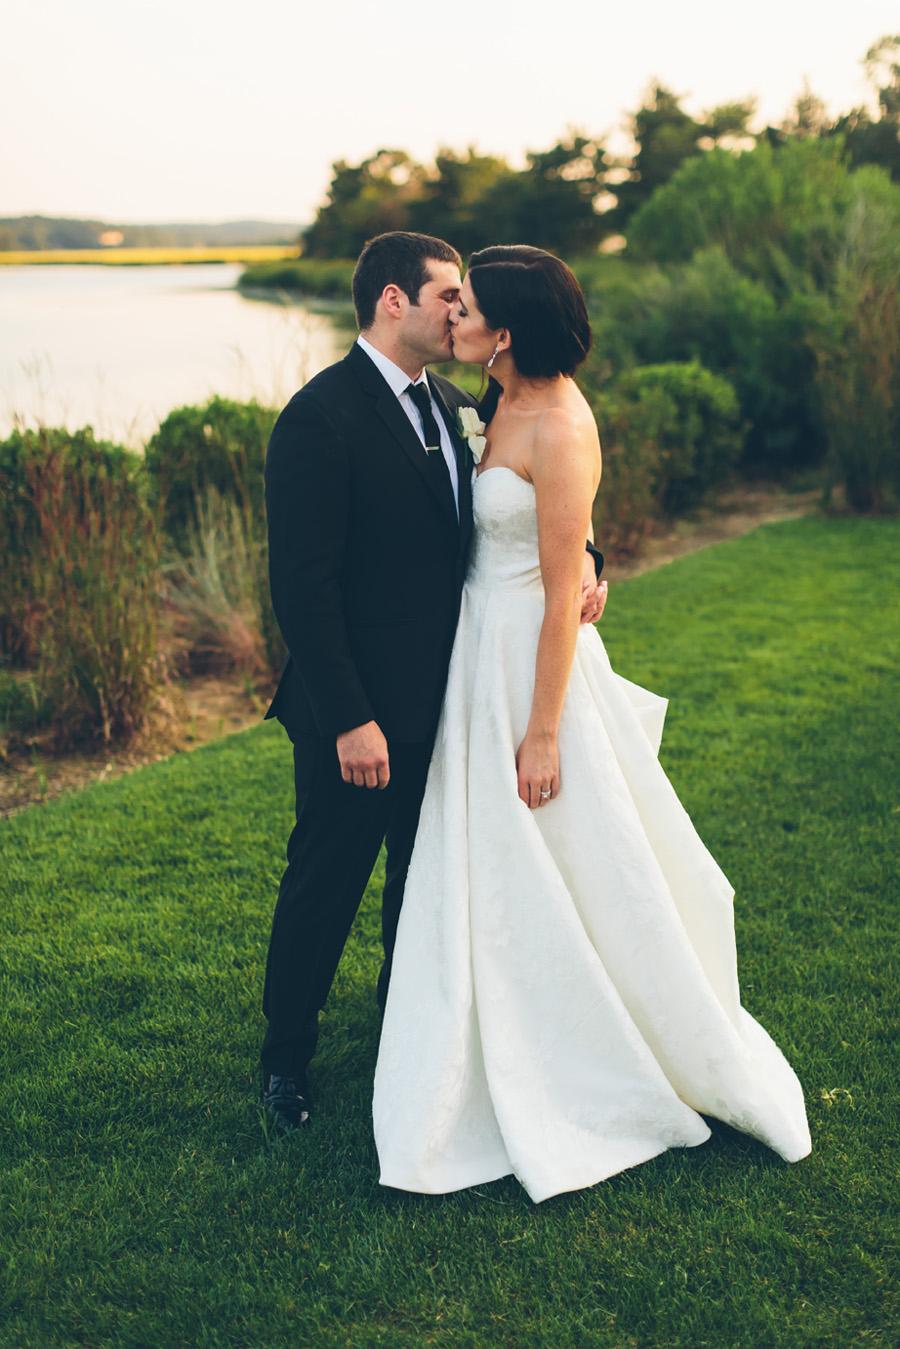 VICTORIA-BRIAN-NY-WEDDING-BRIDEGROOM-CYNTHIACHUNG-0259.jpg